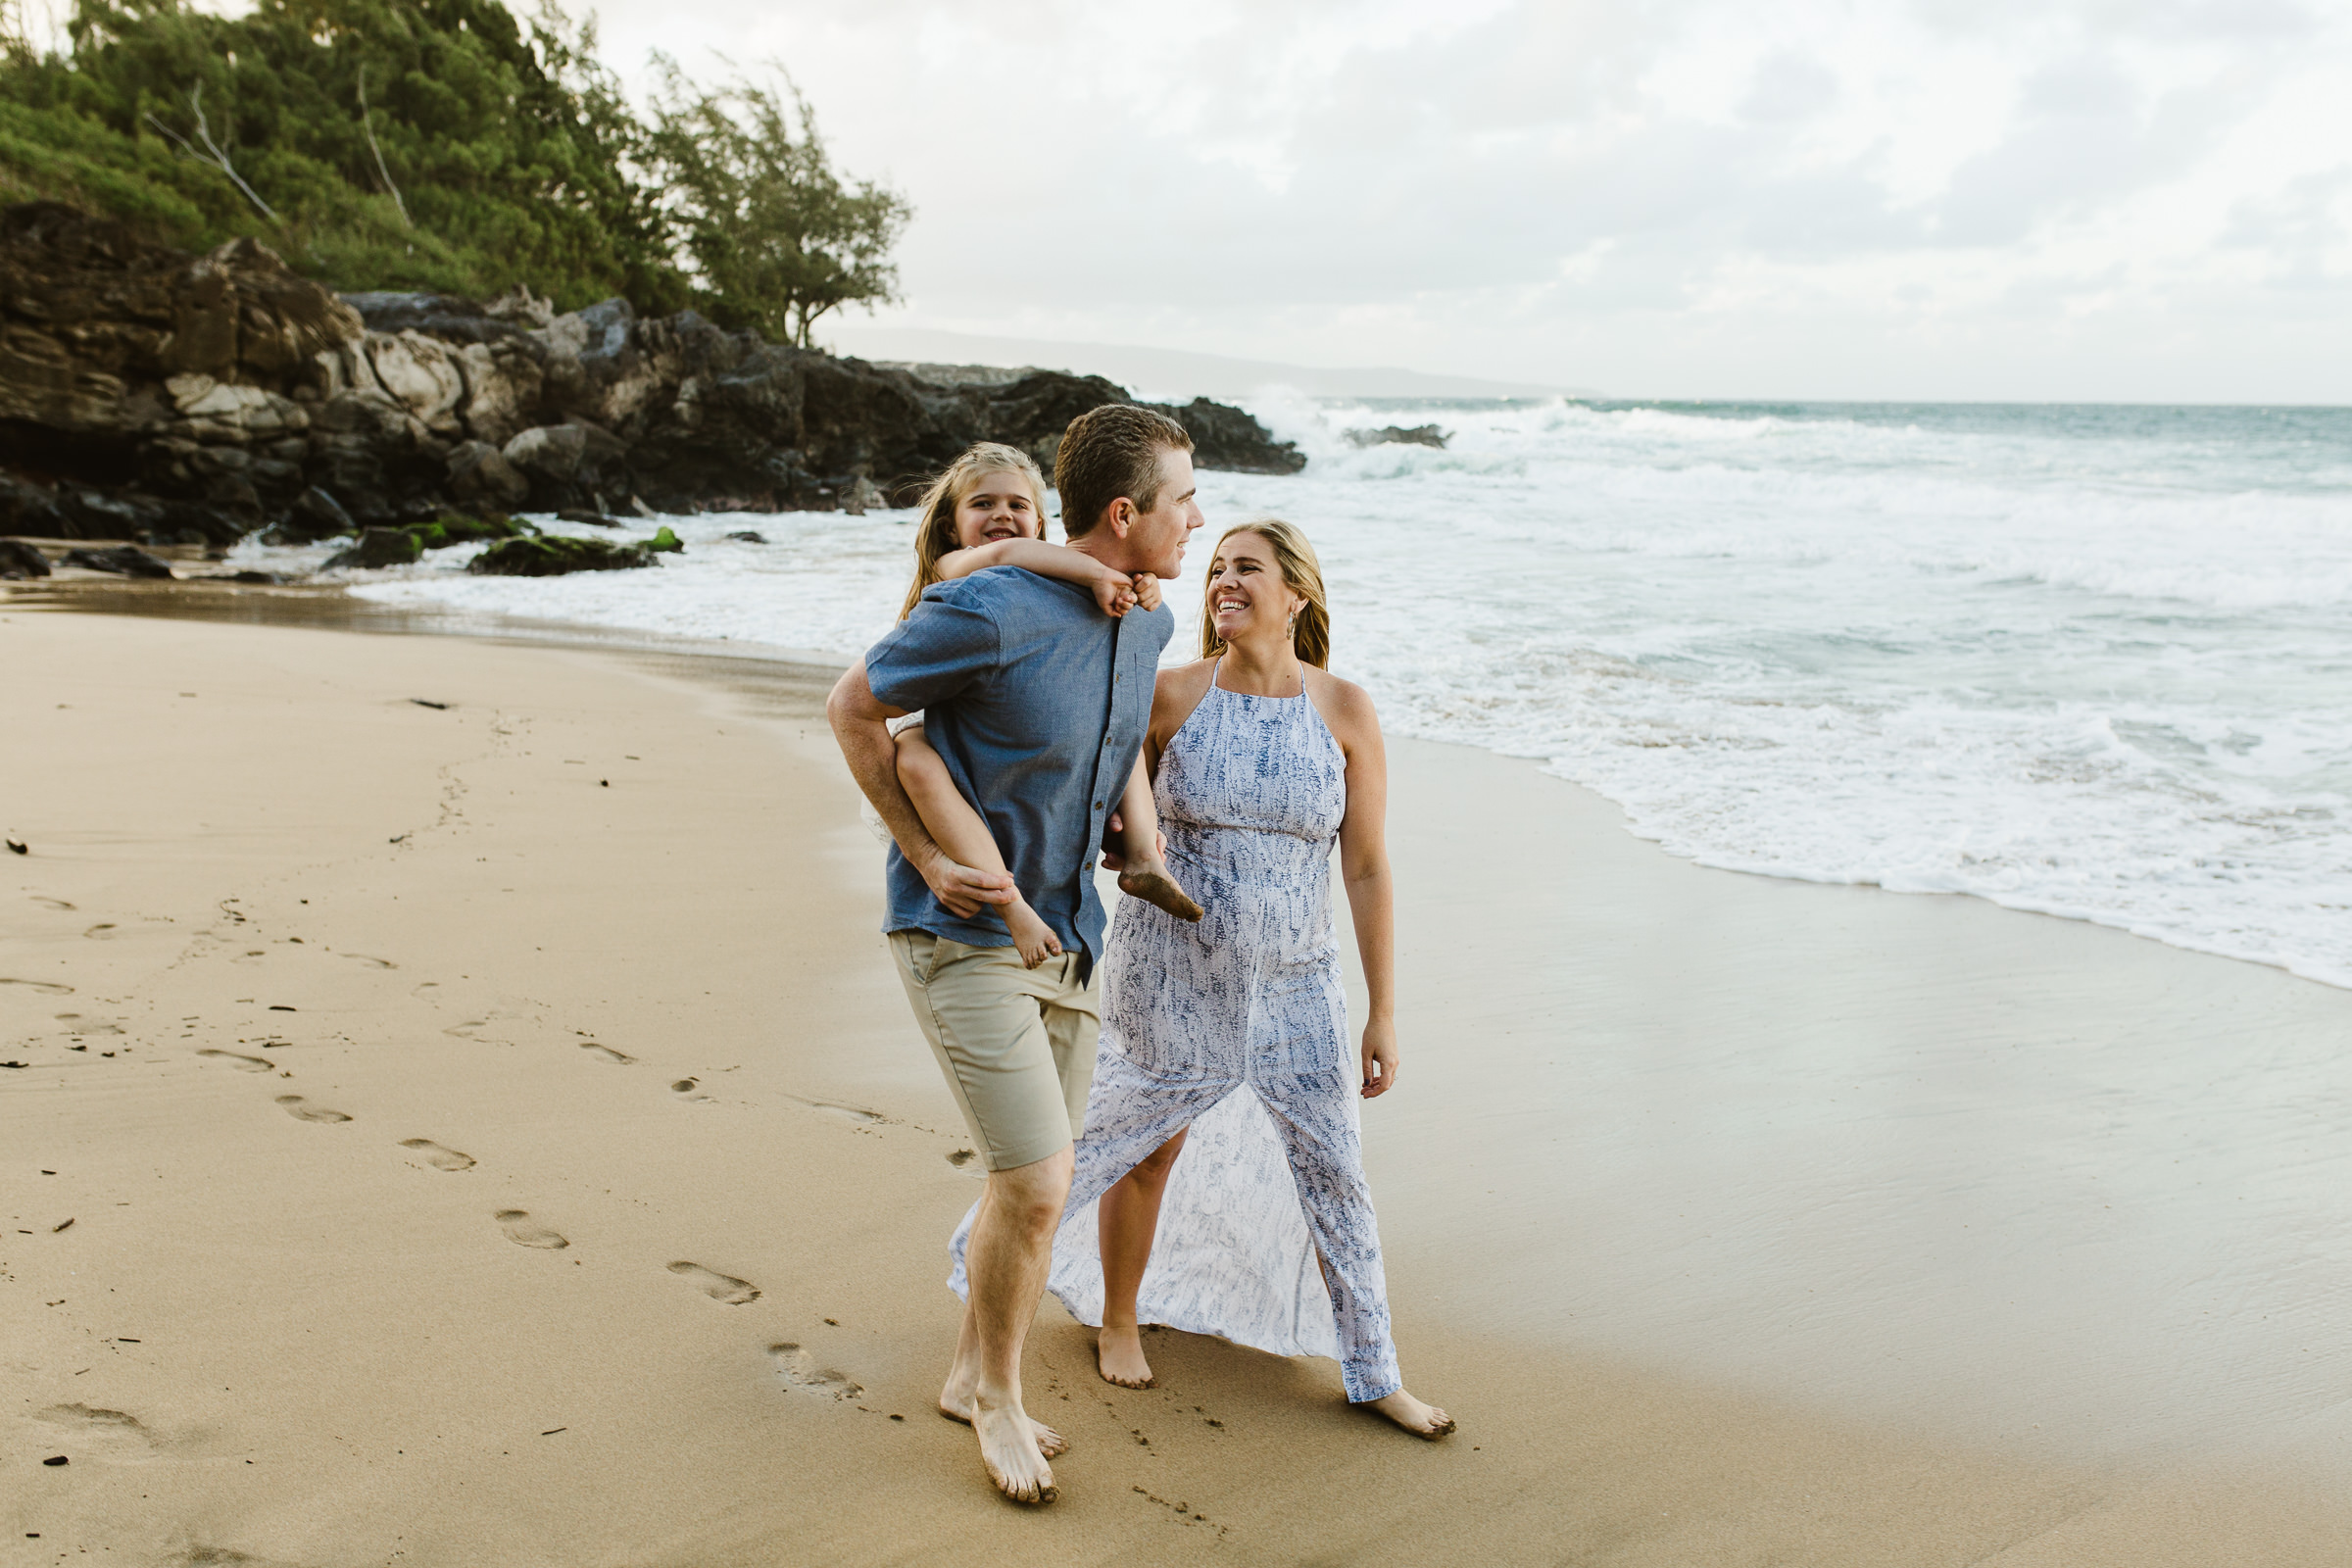 family_dtfleming_beach_maui-2-1.jpg